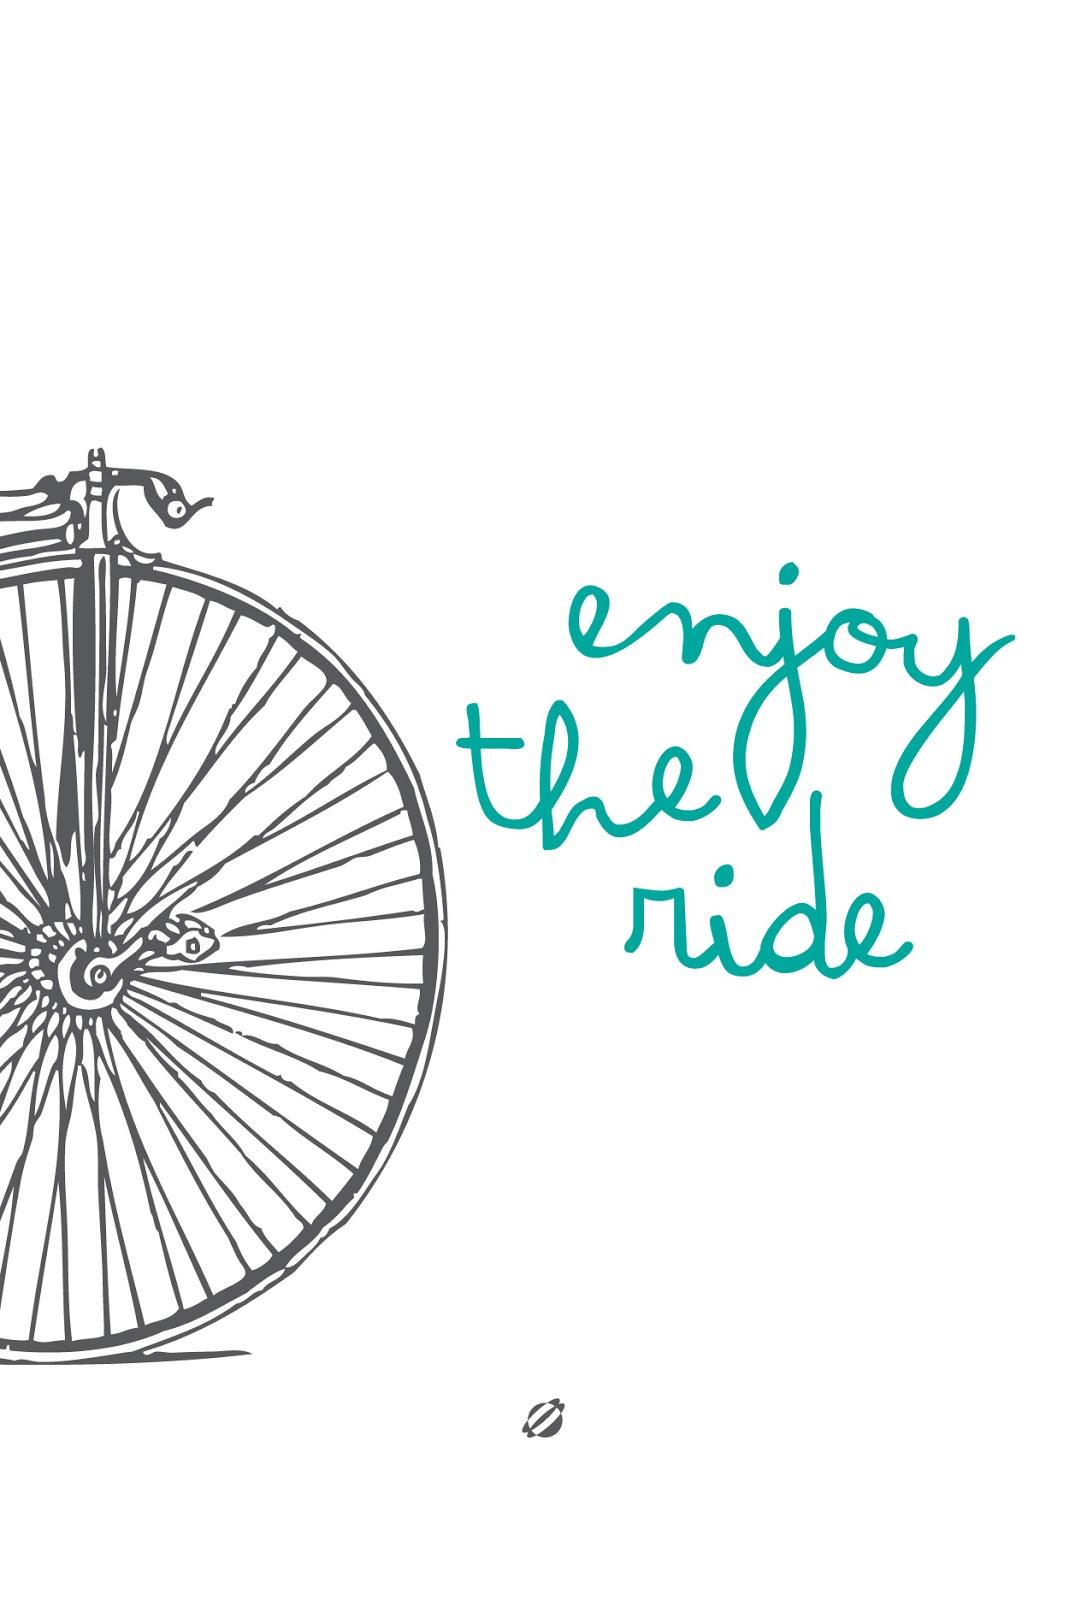 LostBumblebee: Enjoy the Ride.